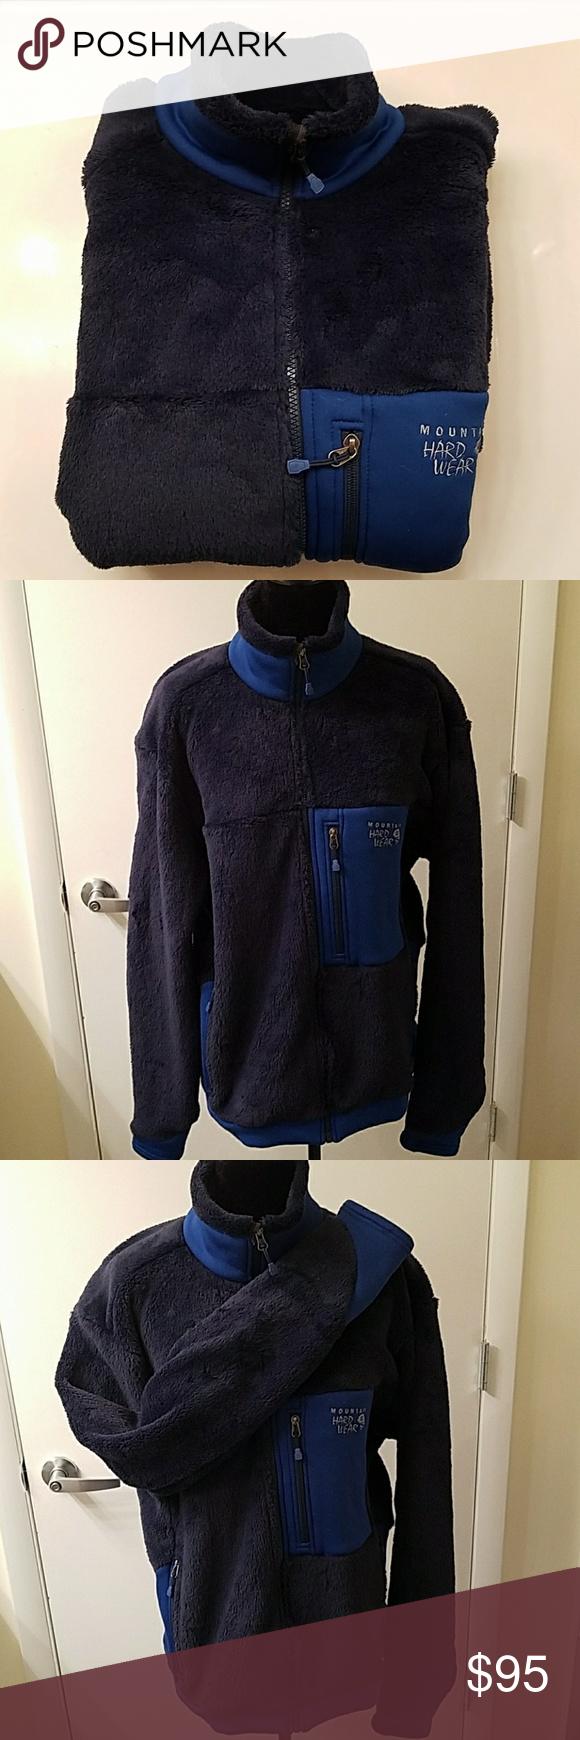 Mountain hardwear monkey man fleece jacket menus mountain hardwear